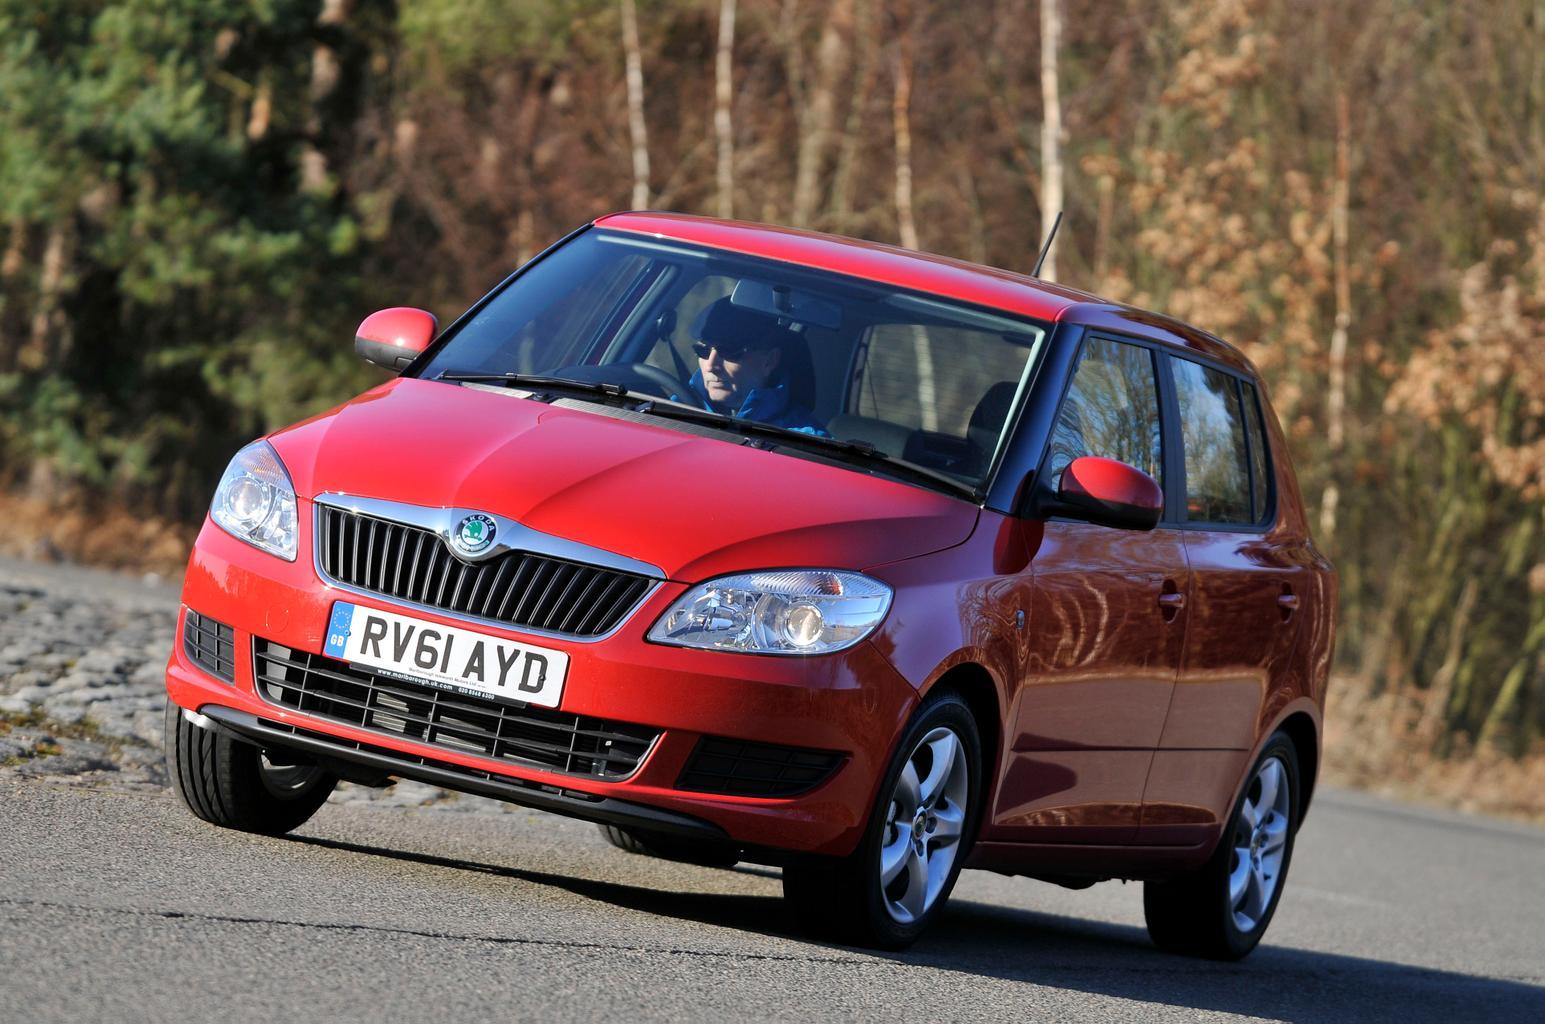 Used test: Chevrolet Aveo vs Skoda Fabia vs Suzuki Swift